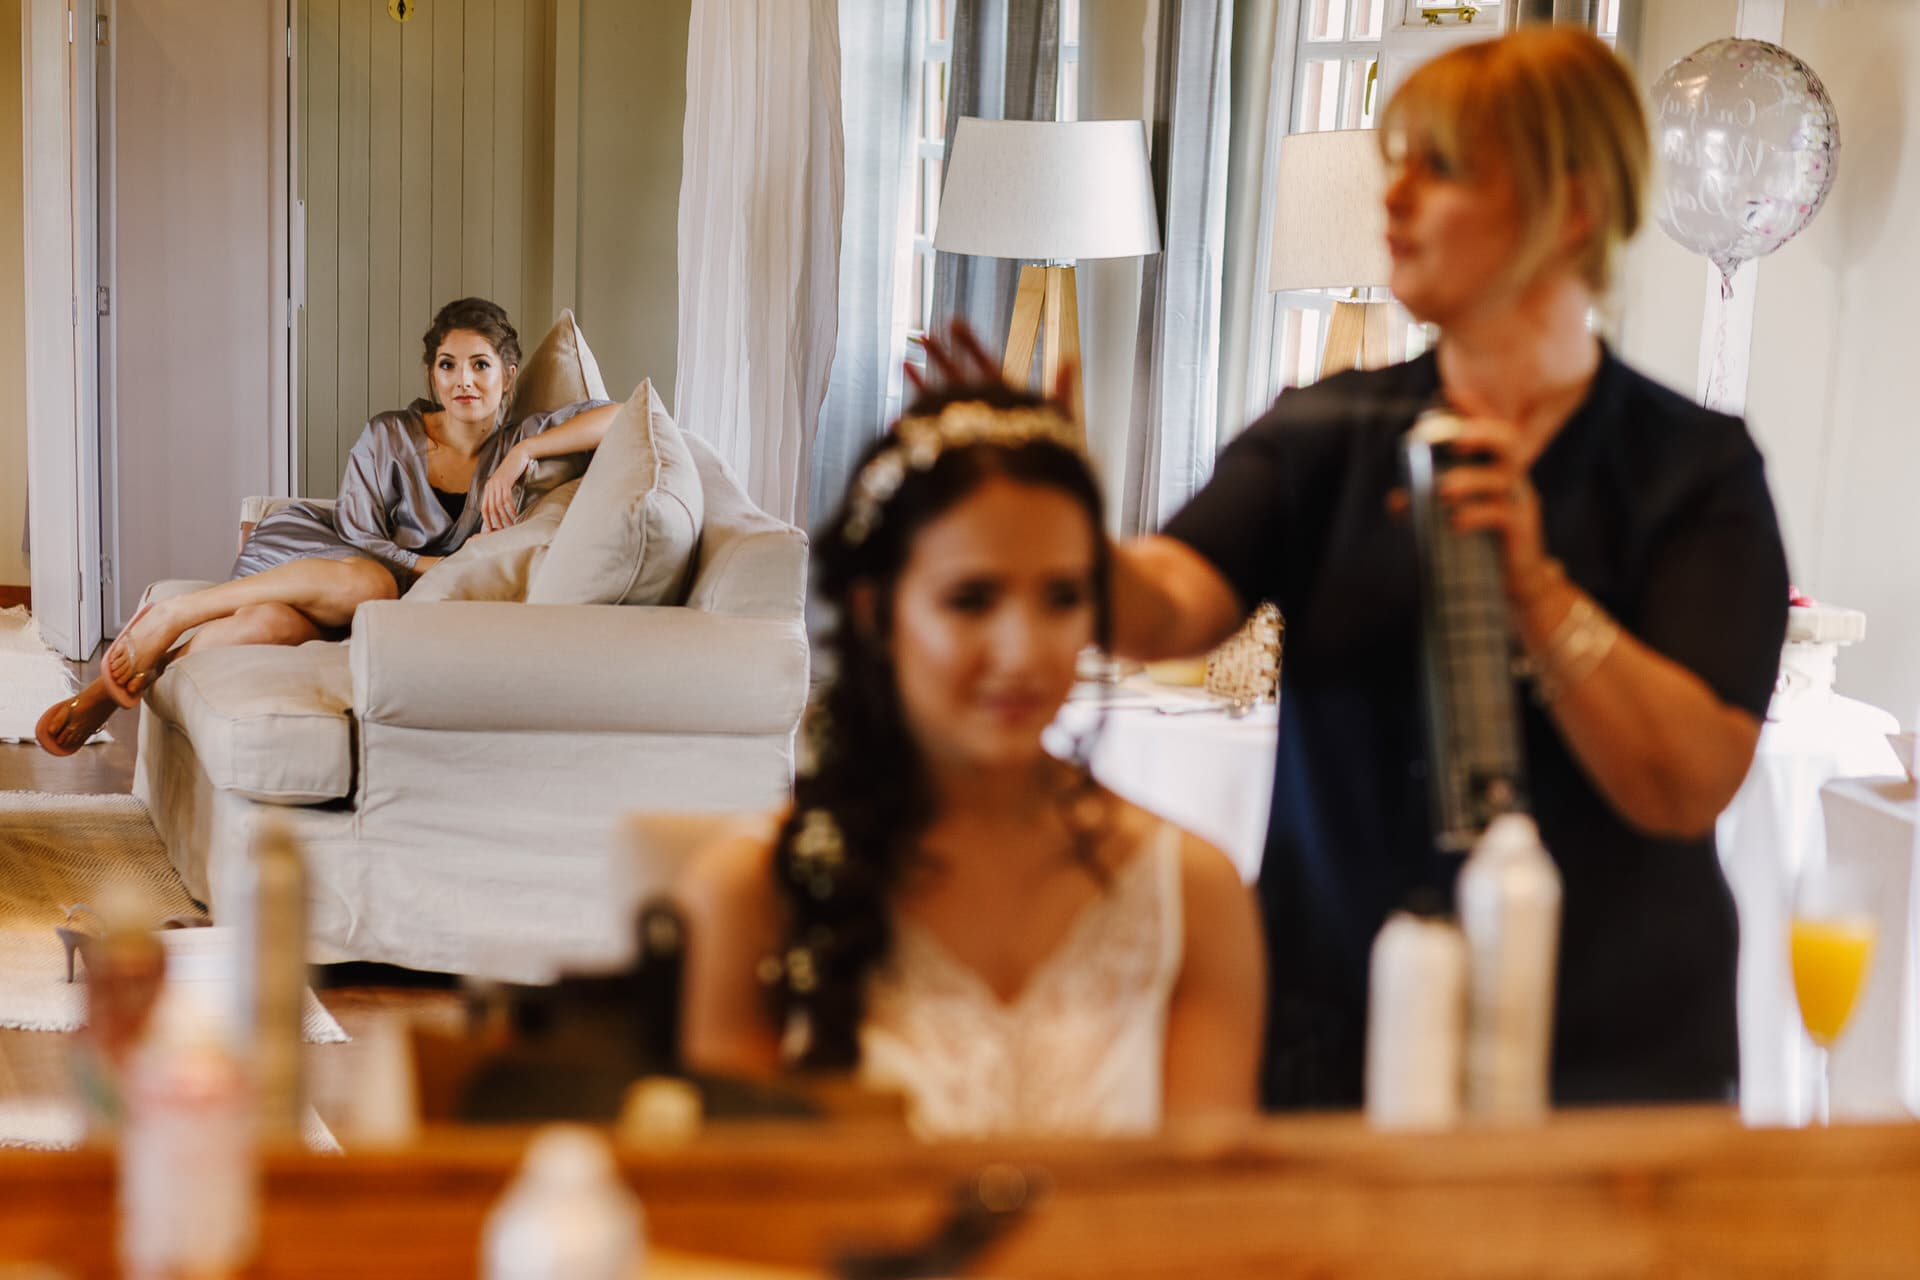 How should I choose my bridesmaids